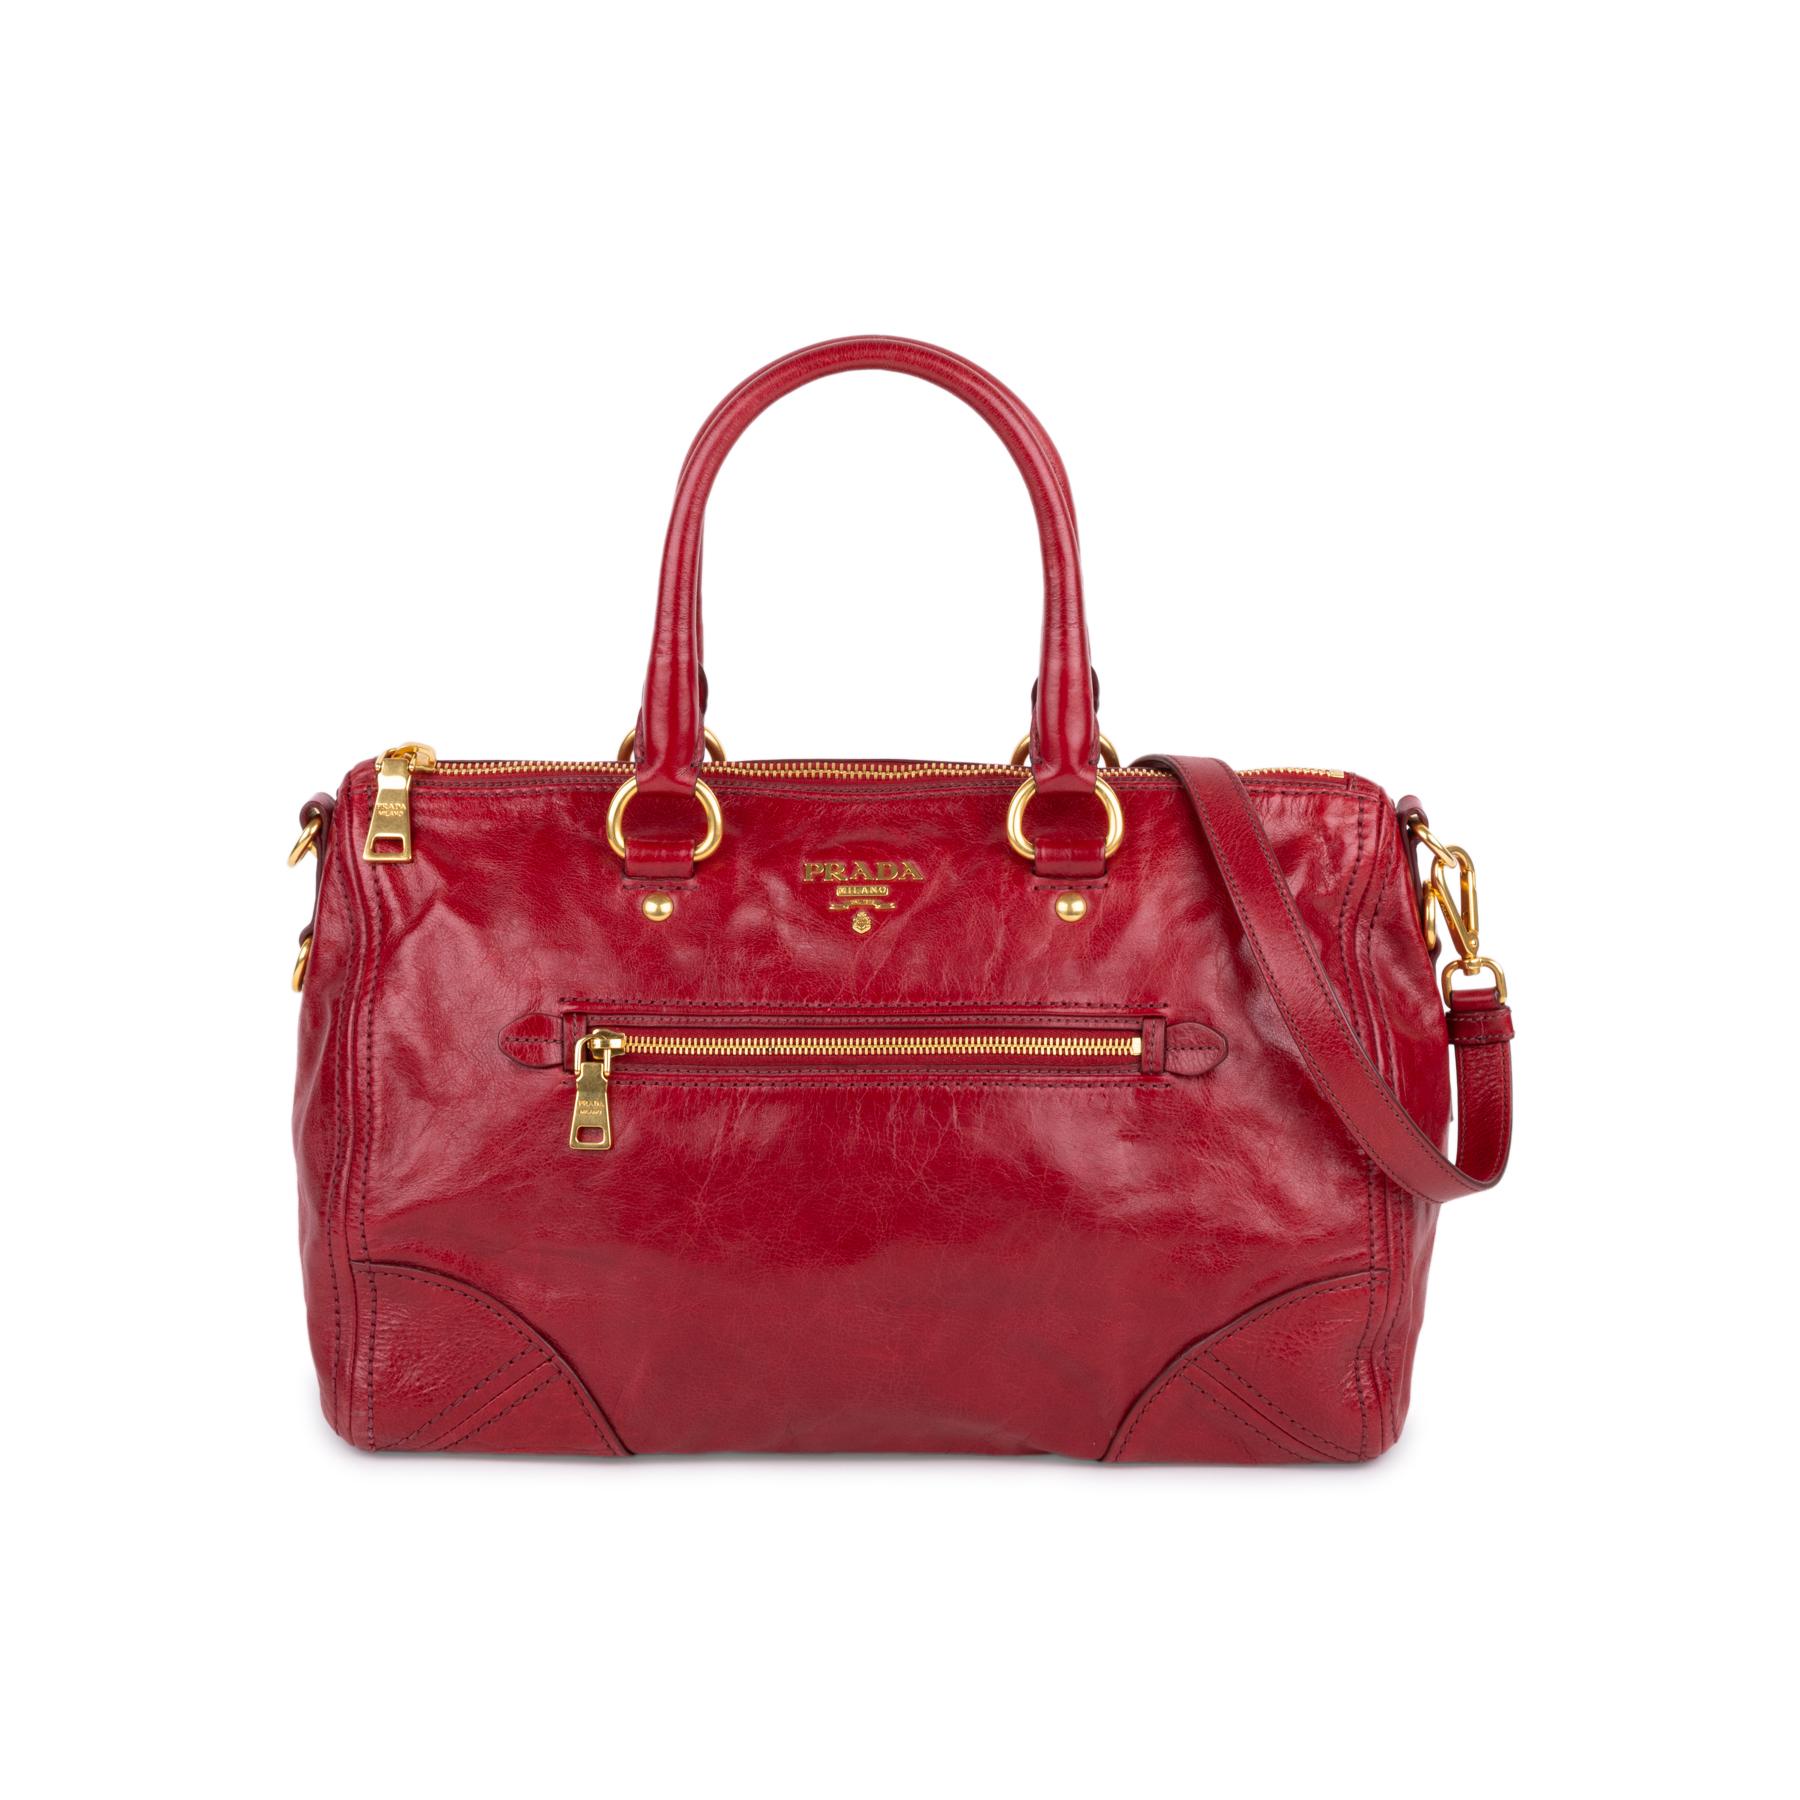 4d447fc6f73d Authentic Second Hand Prada Vitello Shine Satchel Bag (PSS-333-00061 ...